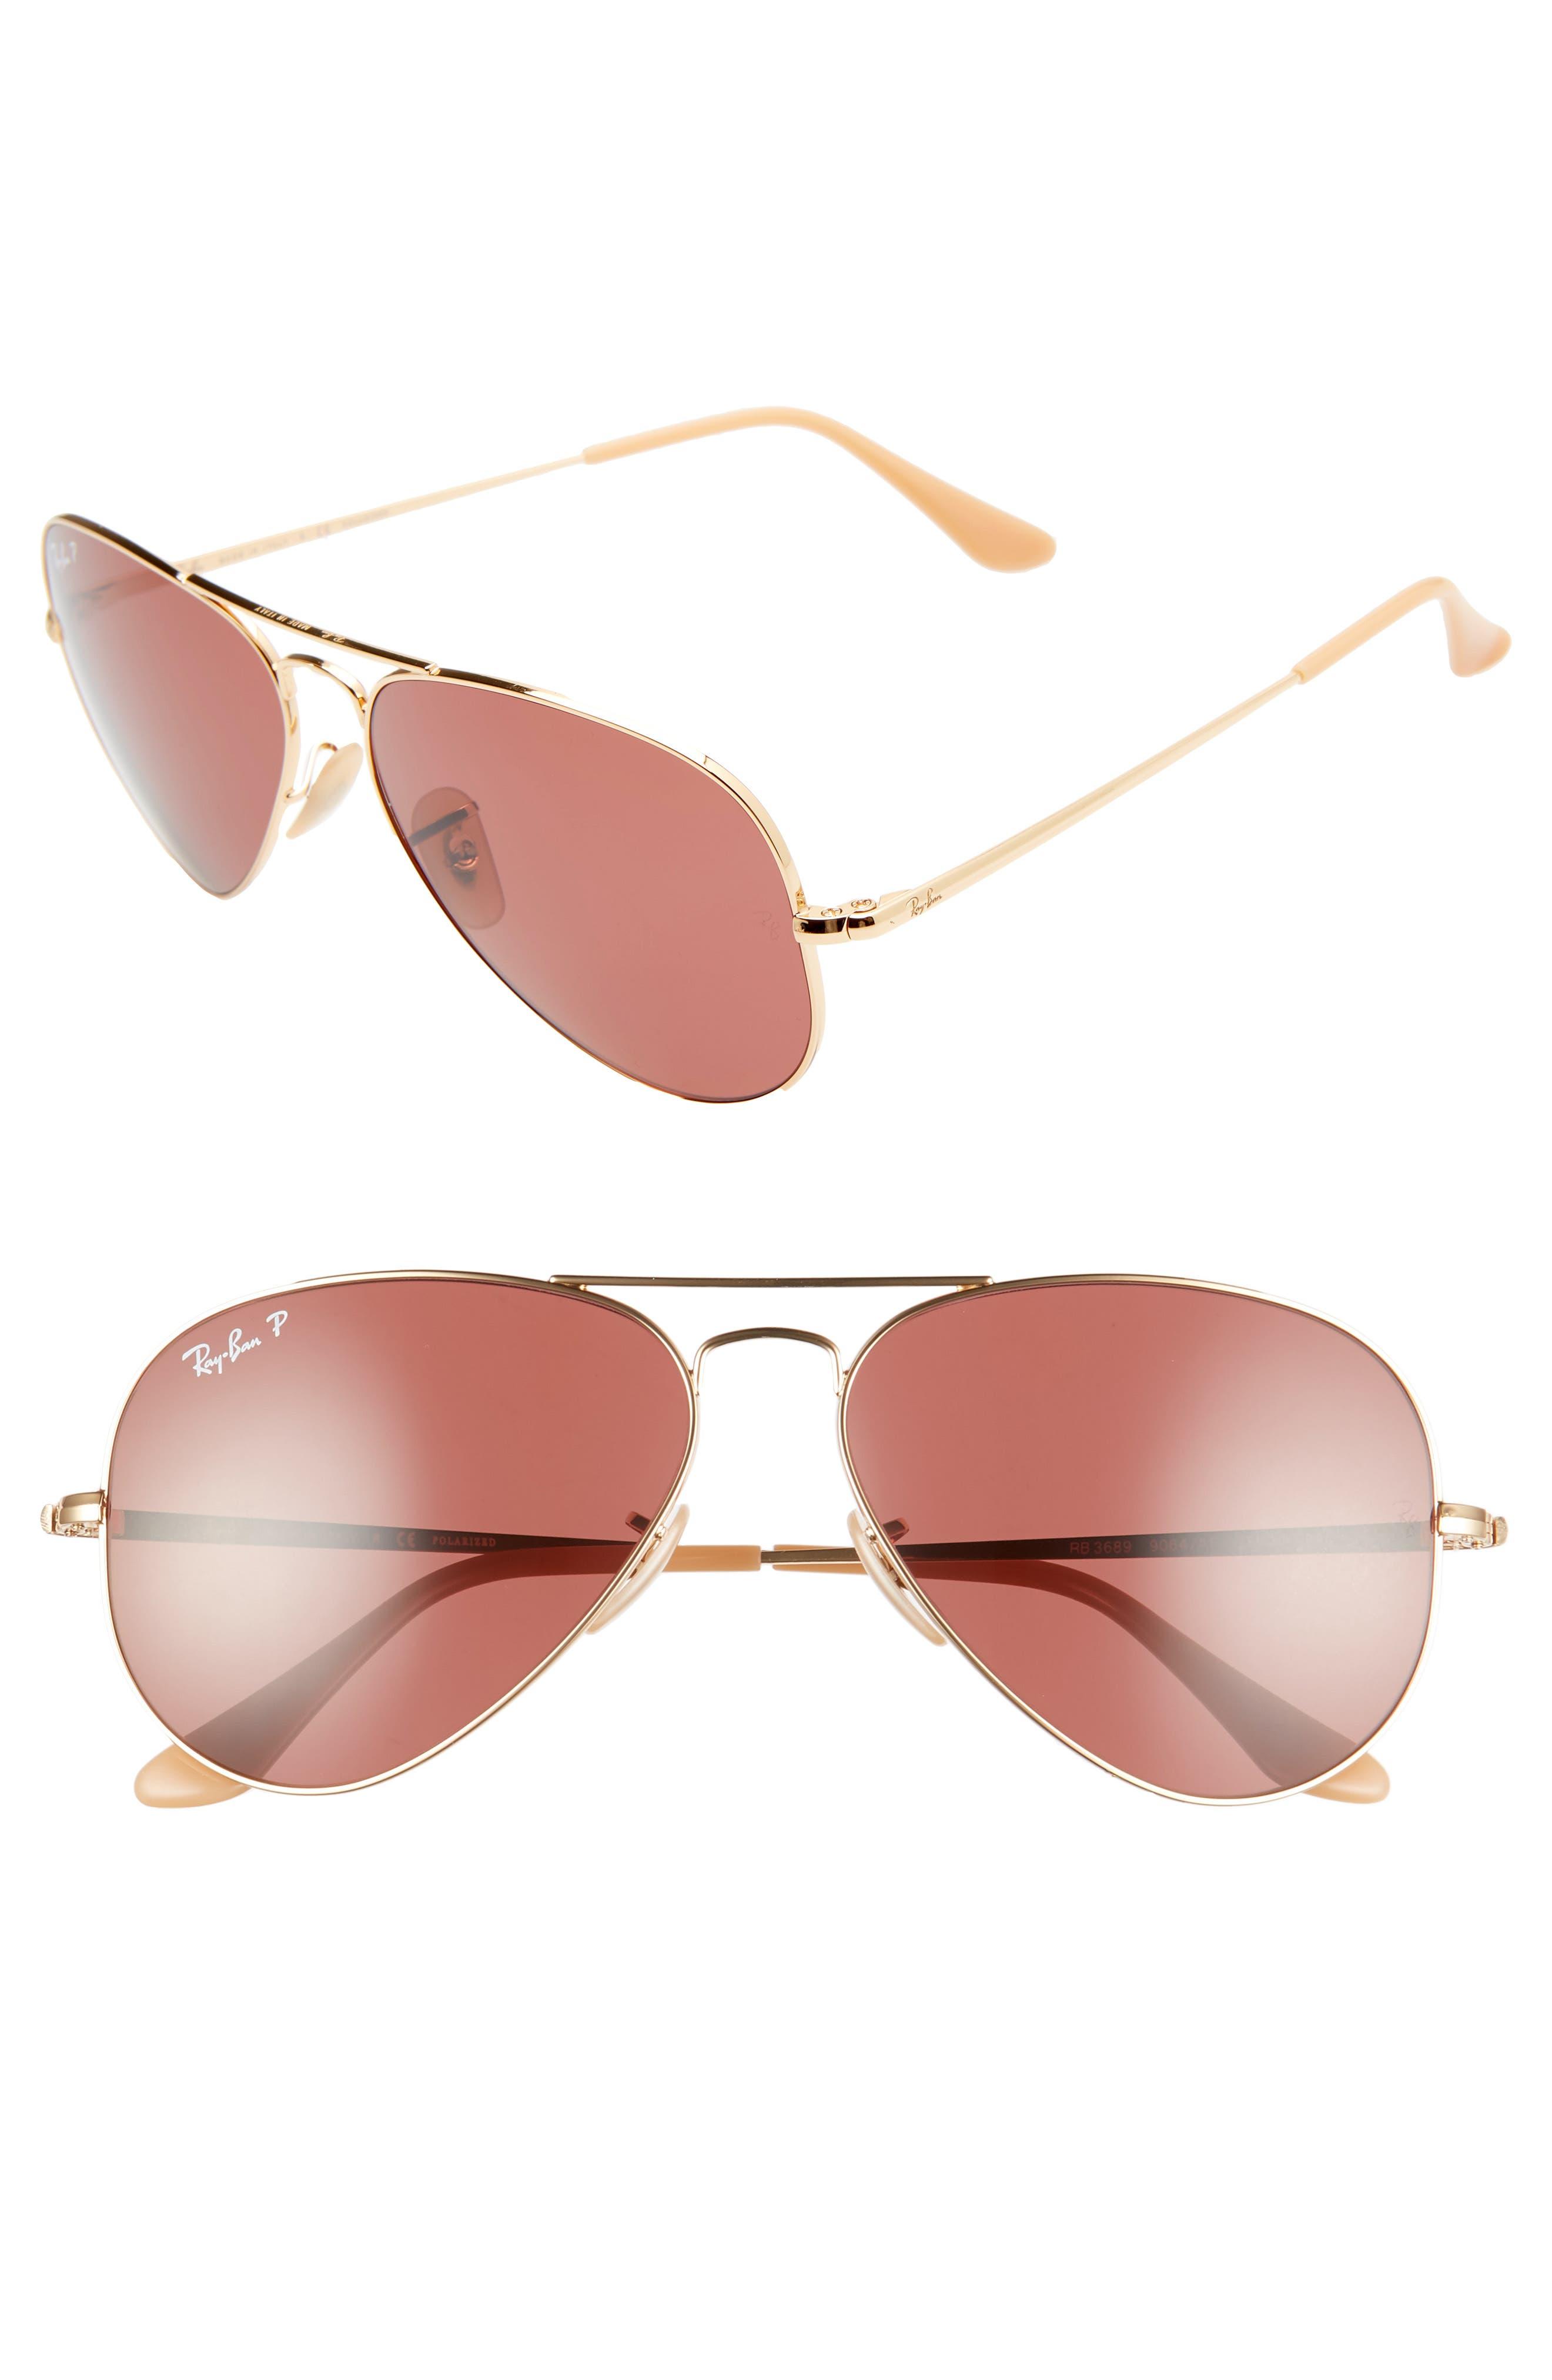 3f30c2dc4ead Women's Sunglasses - $200 to $250